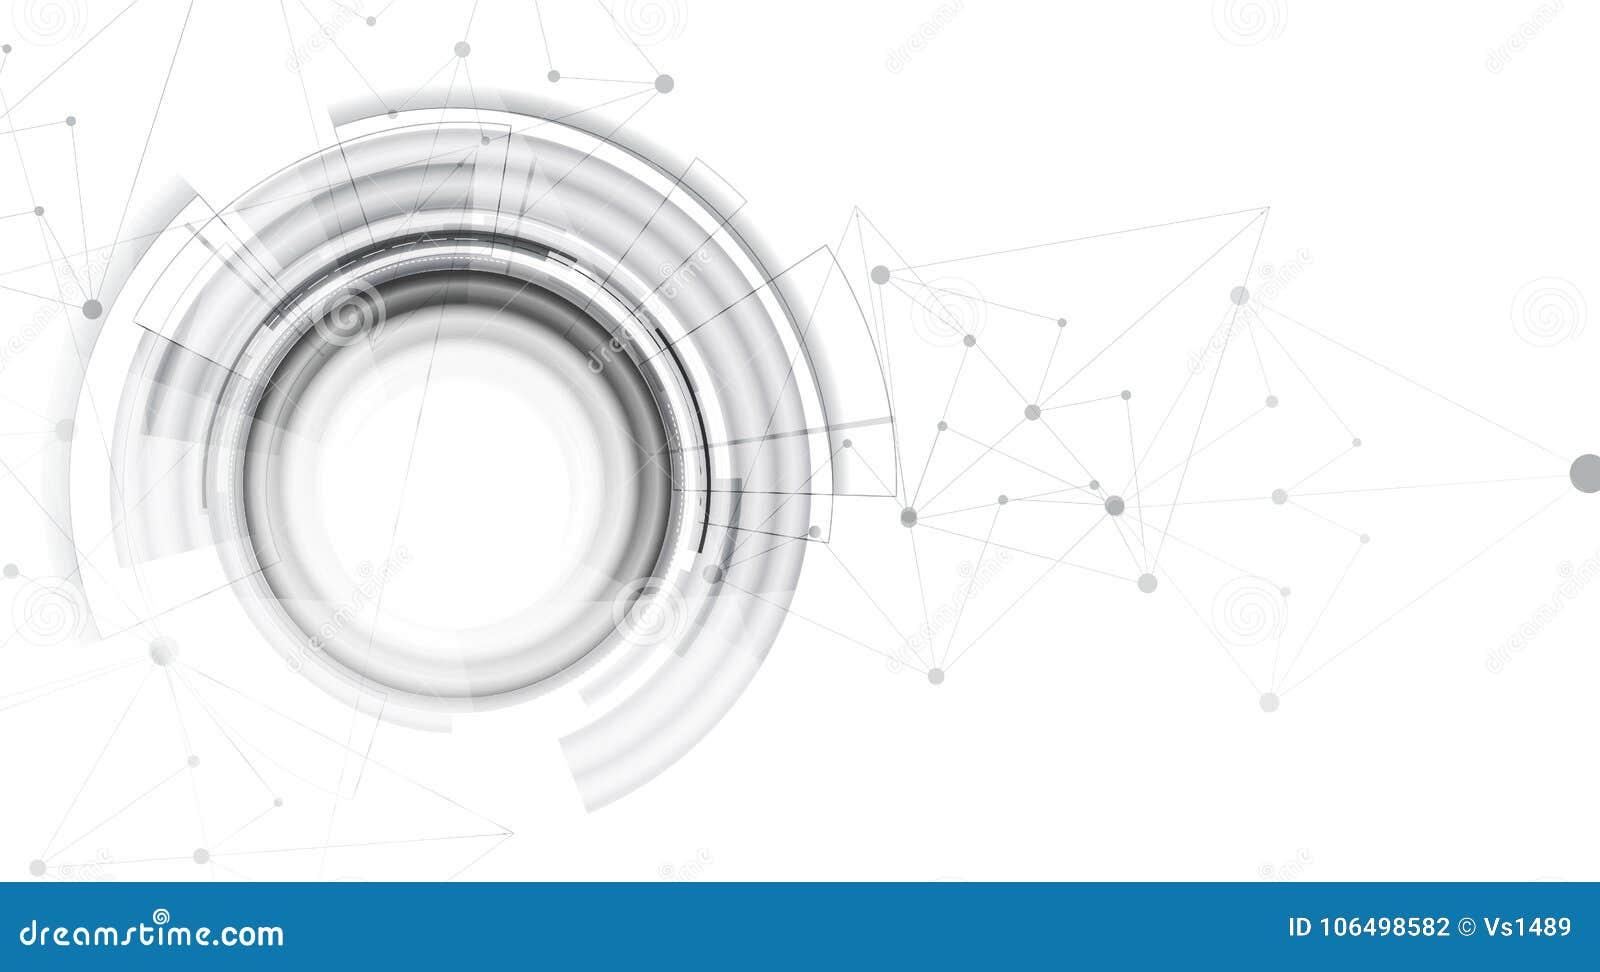 Concepto de la red neuronal Células conectadas con vínculos Alto technol